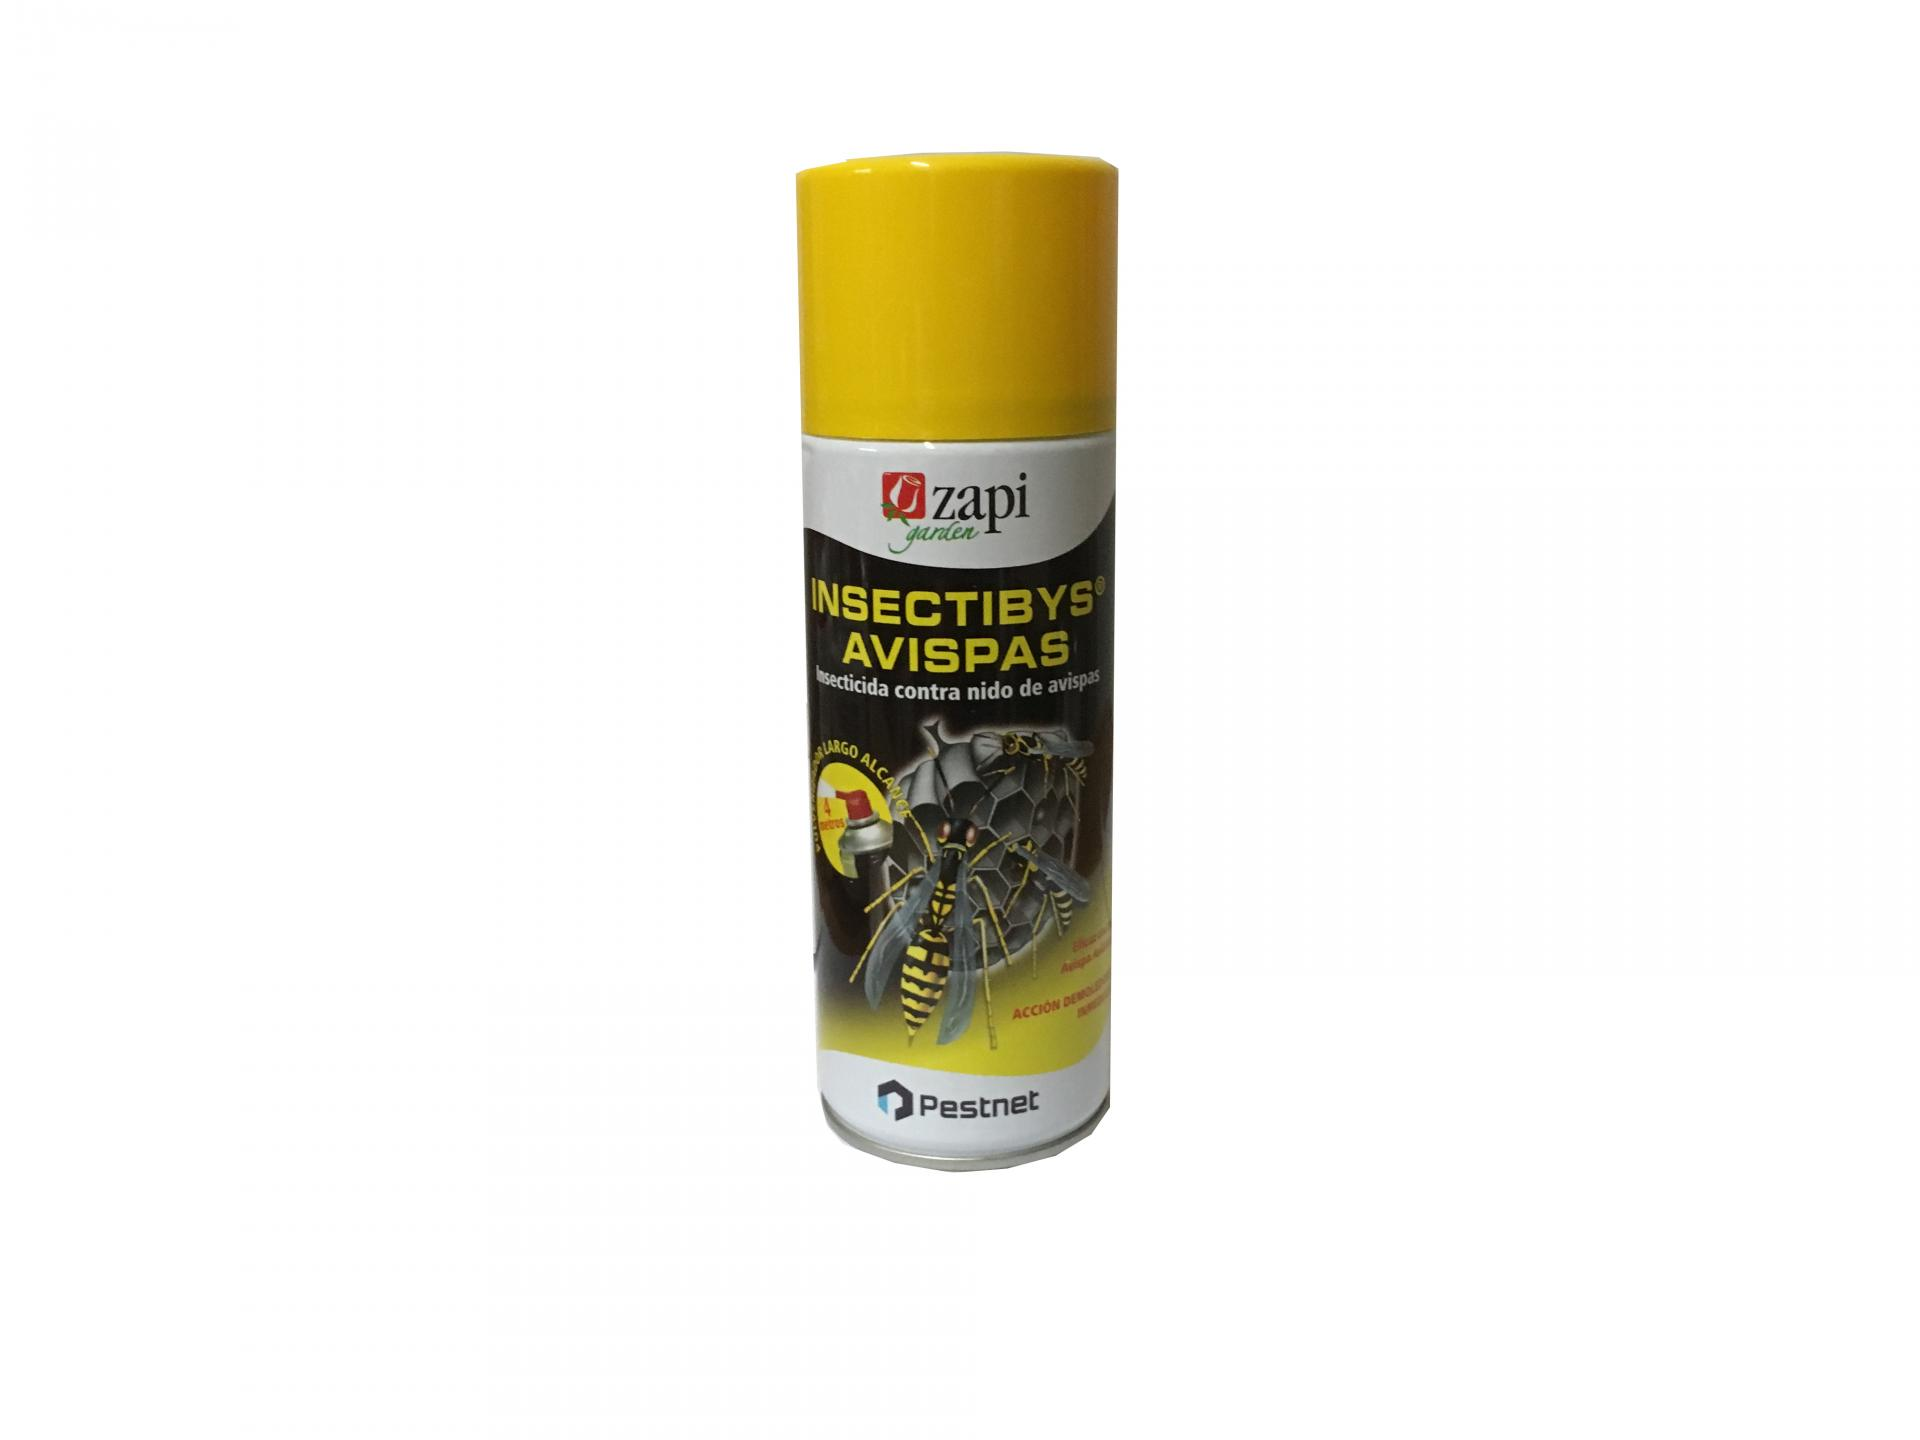 Insecticida Insect IBYS avispas 400 ml (Avispa asiática y o velutina)